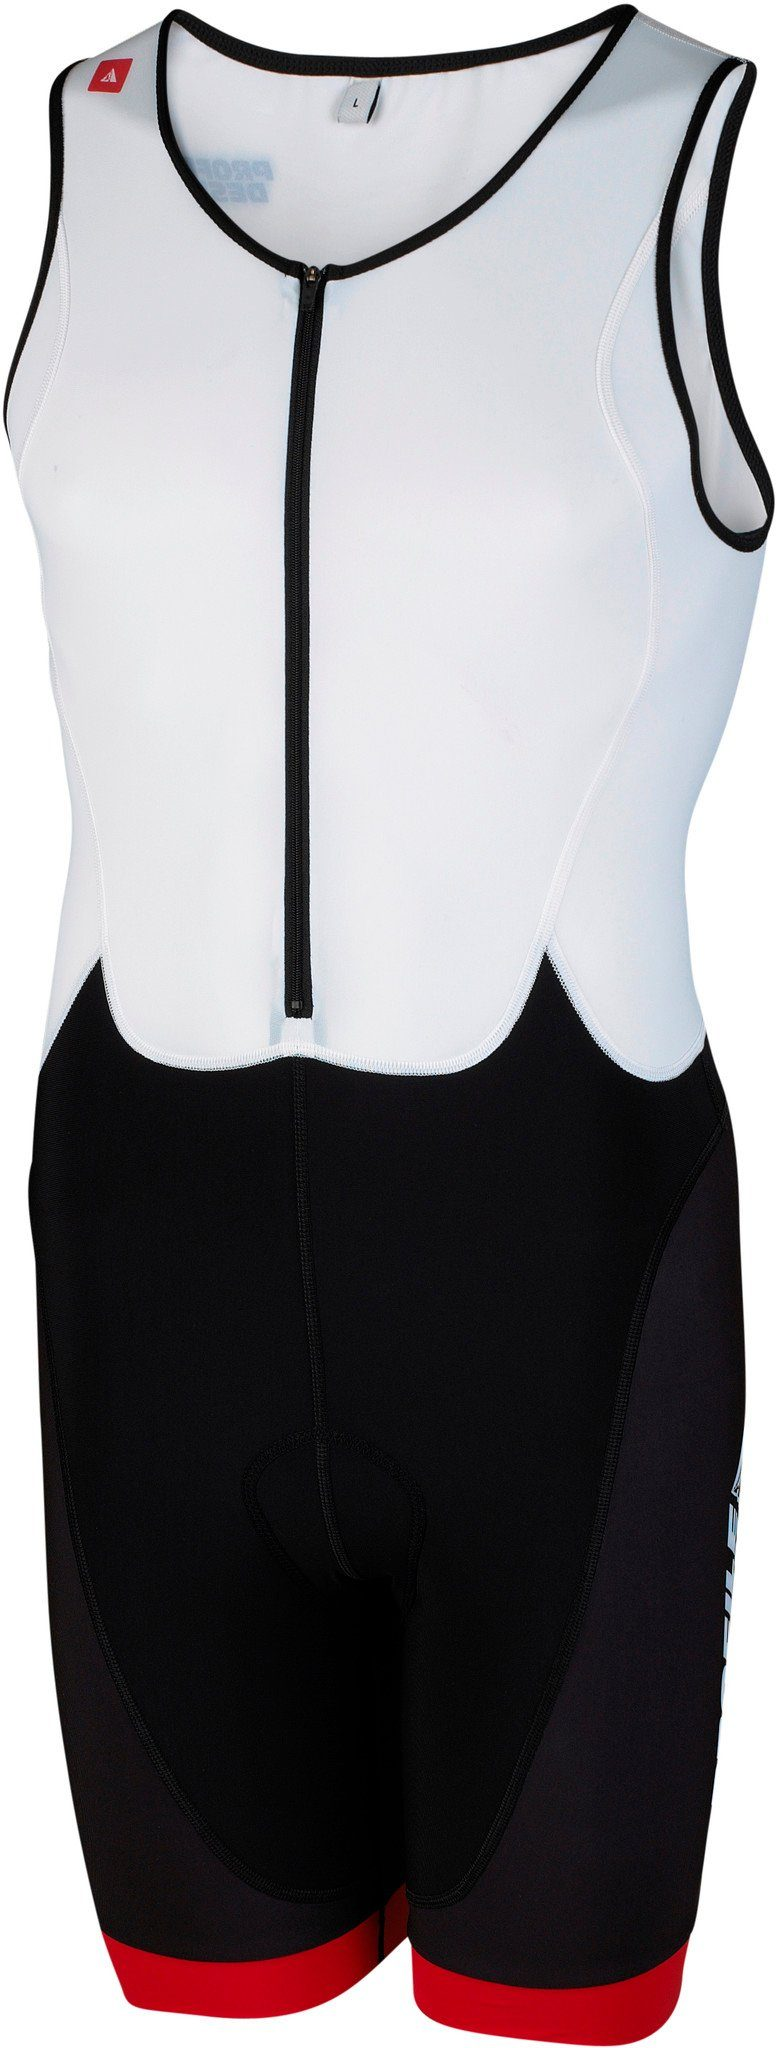 Profile Triathlonbekleidung »Tri Suit Men Front RV«